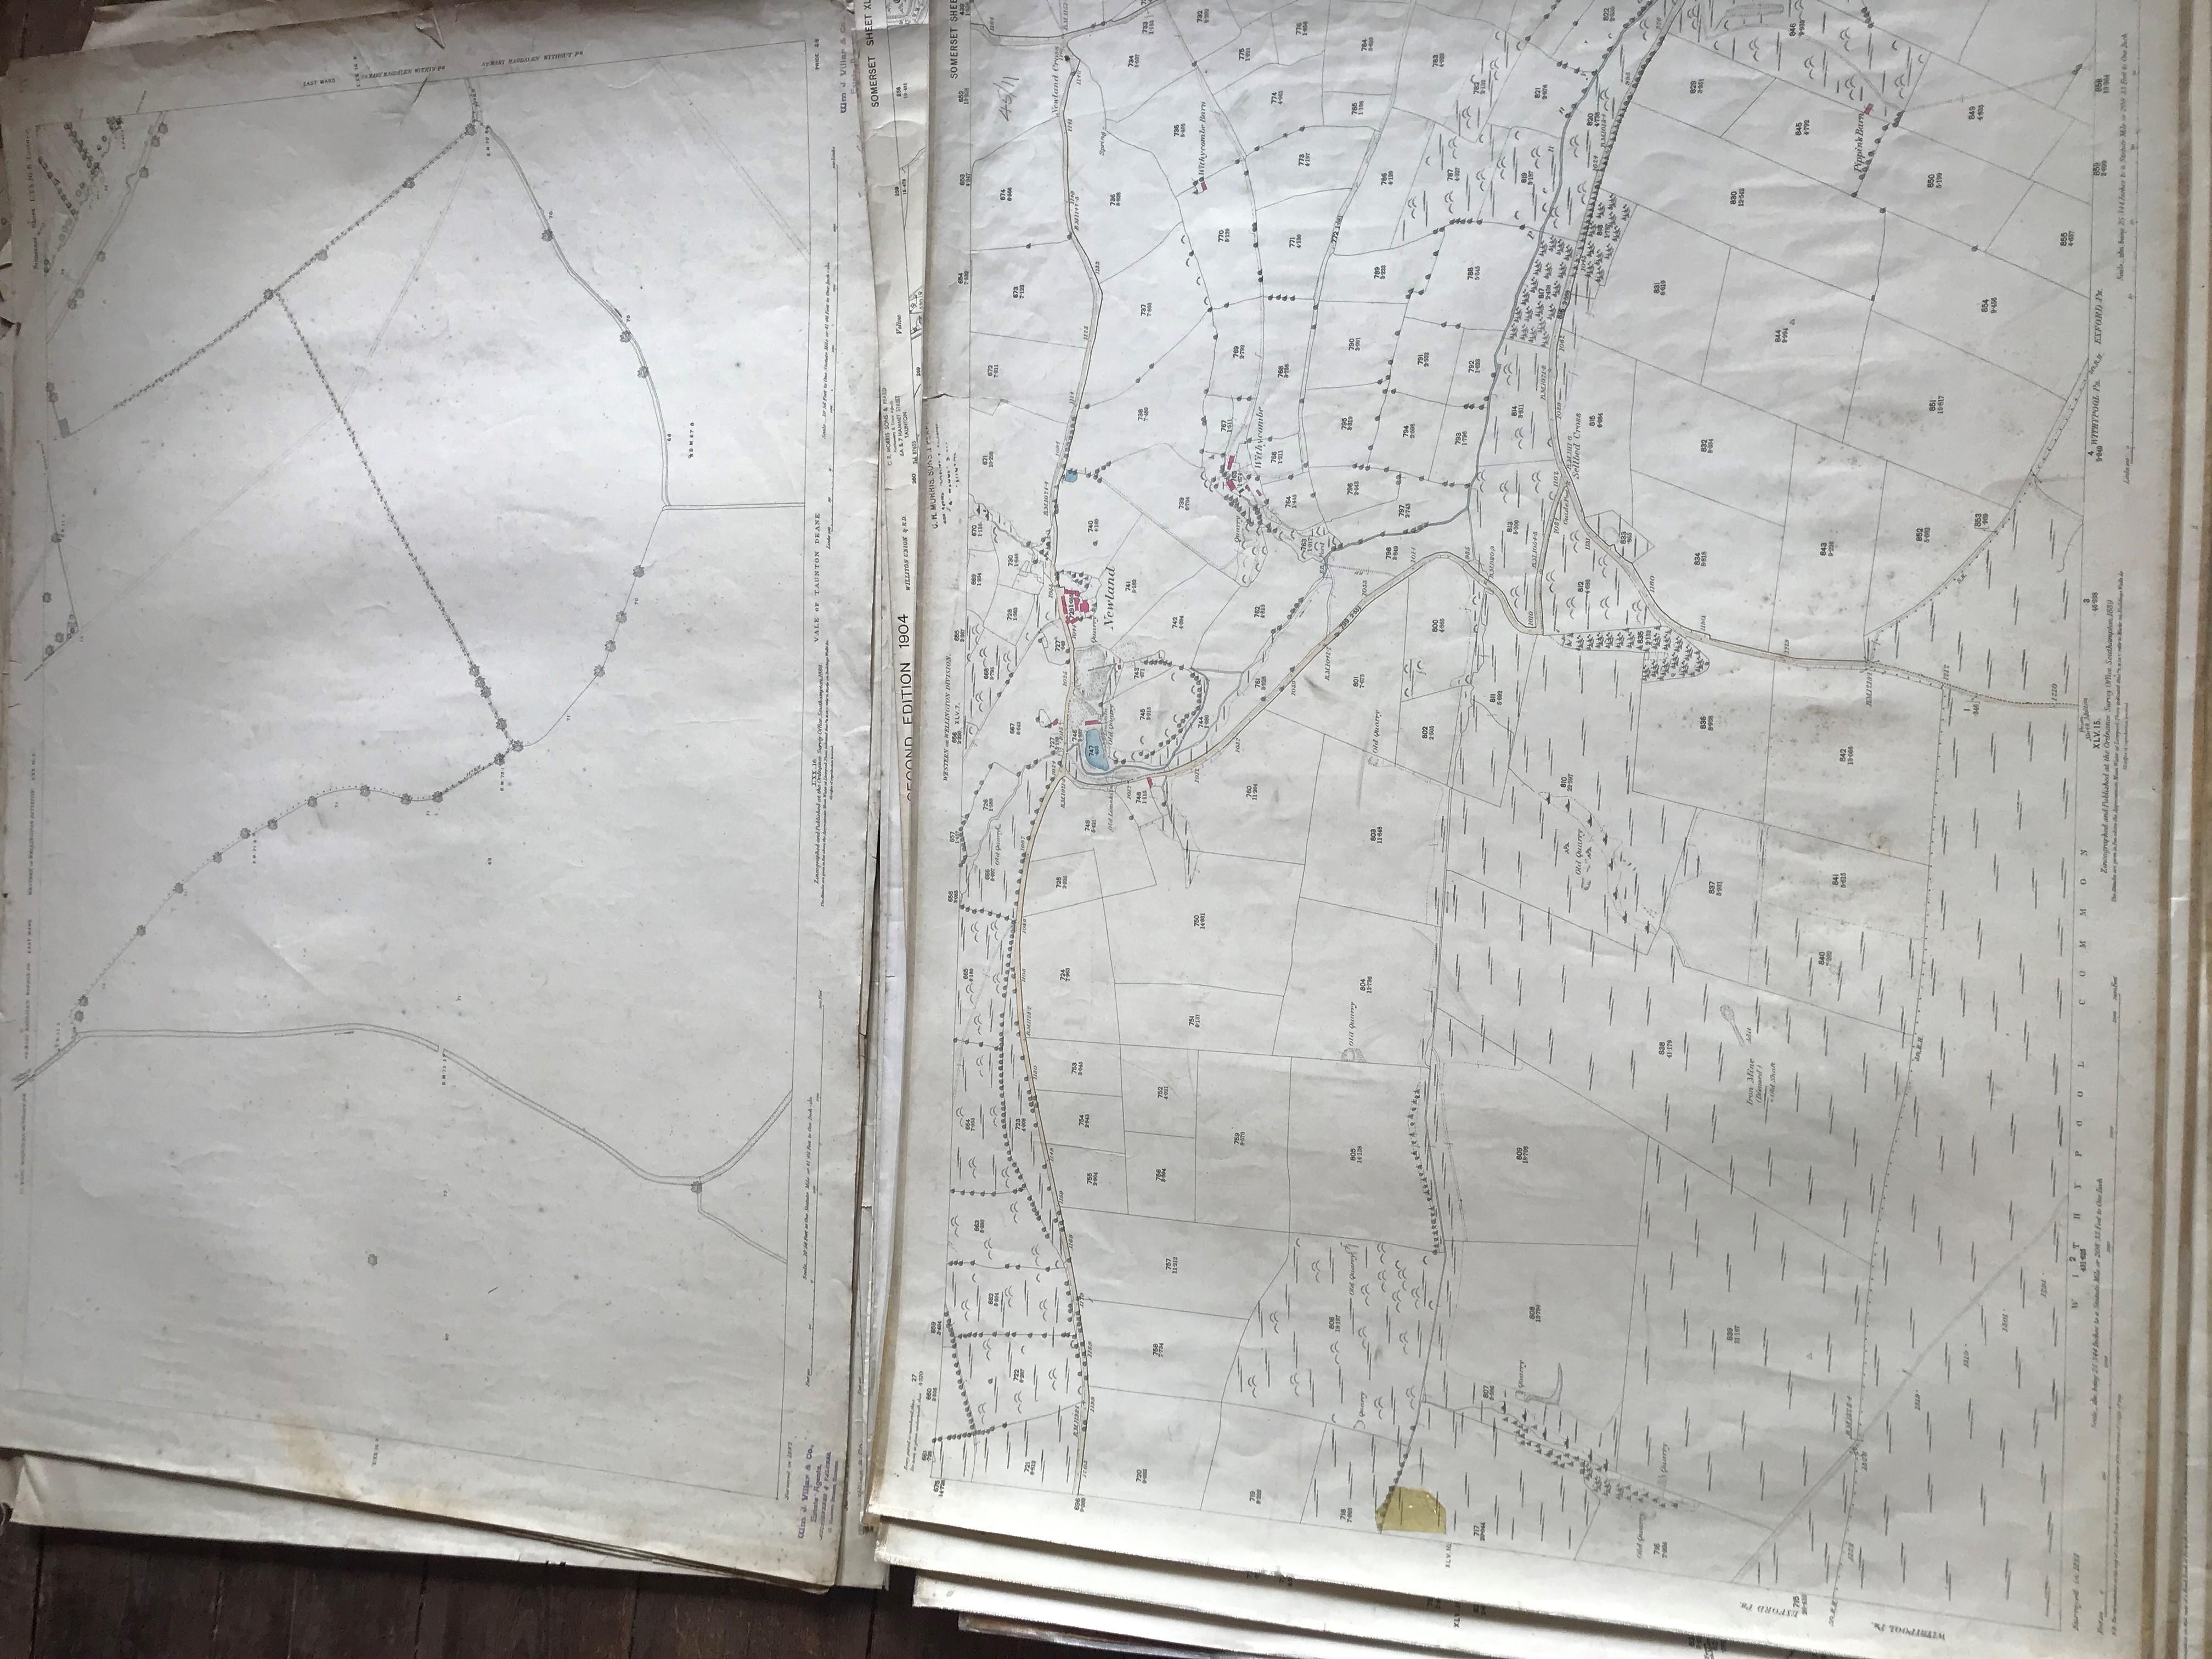 THIRTY 1:2500 ORDNANCE SURVEY MAPS featuring Chelston, Ham, Sampford Brett, Wellington, - Image 5 of 16